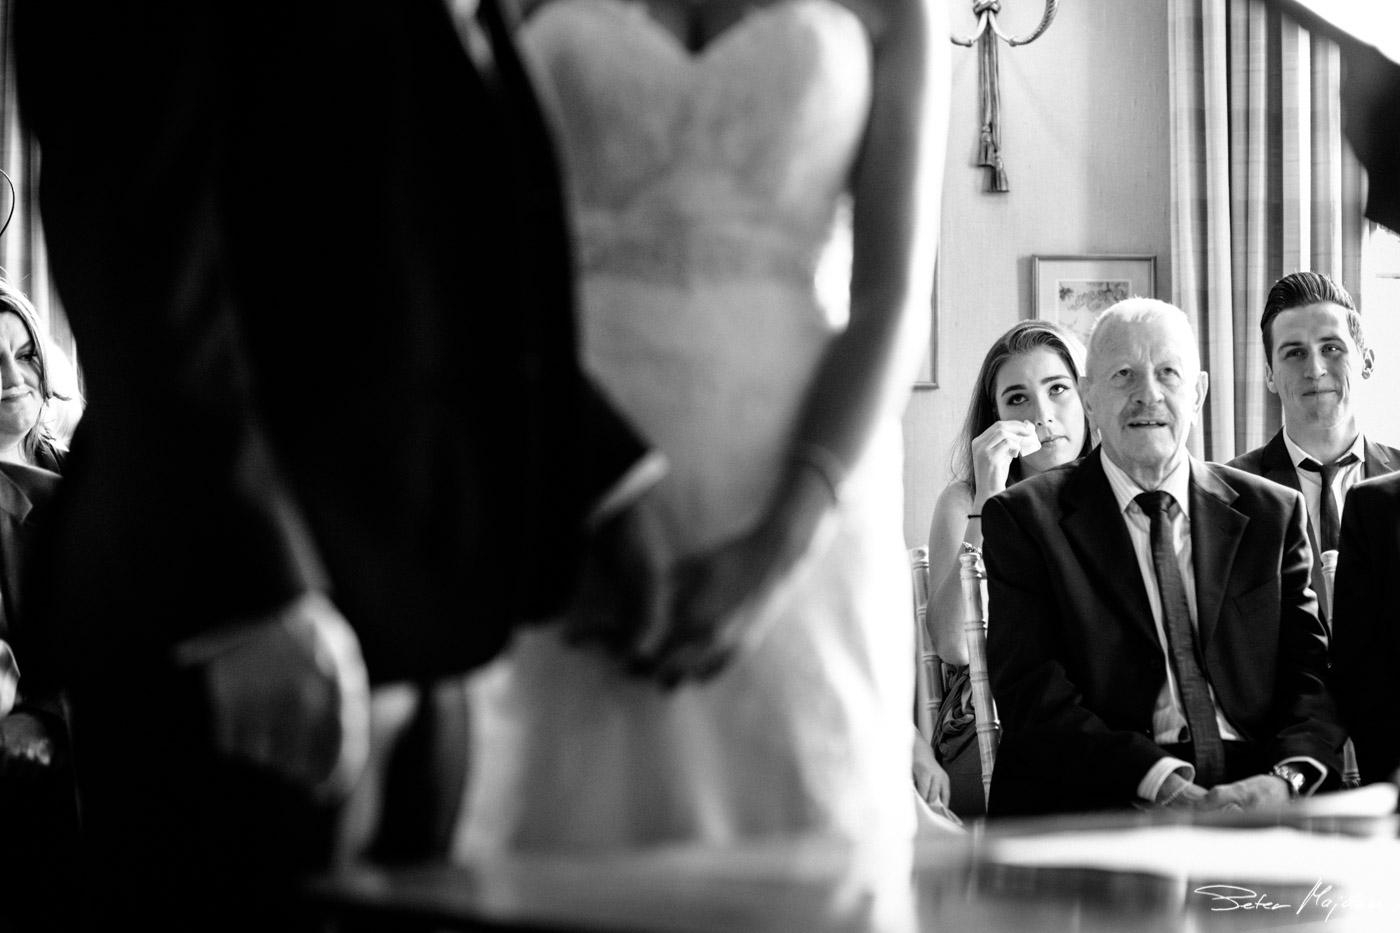 east-bridgford-hill-wedding-photography-30.jpg